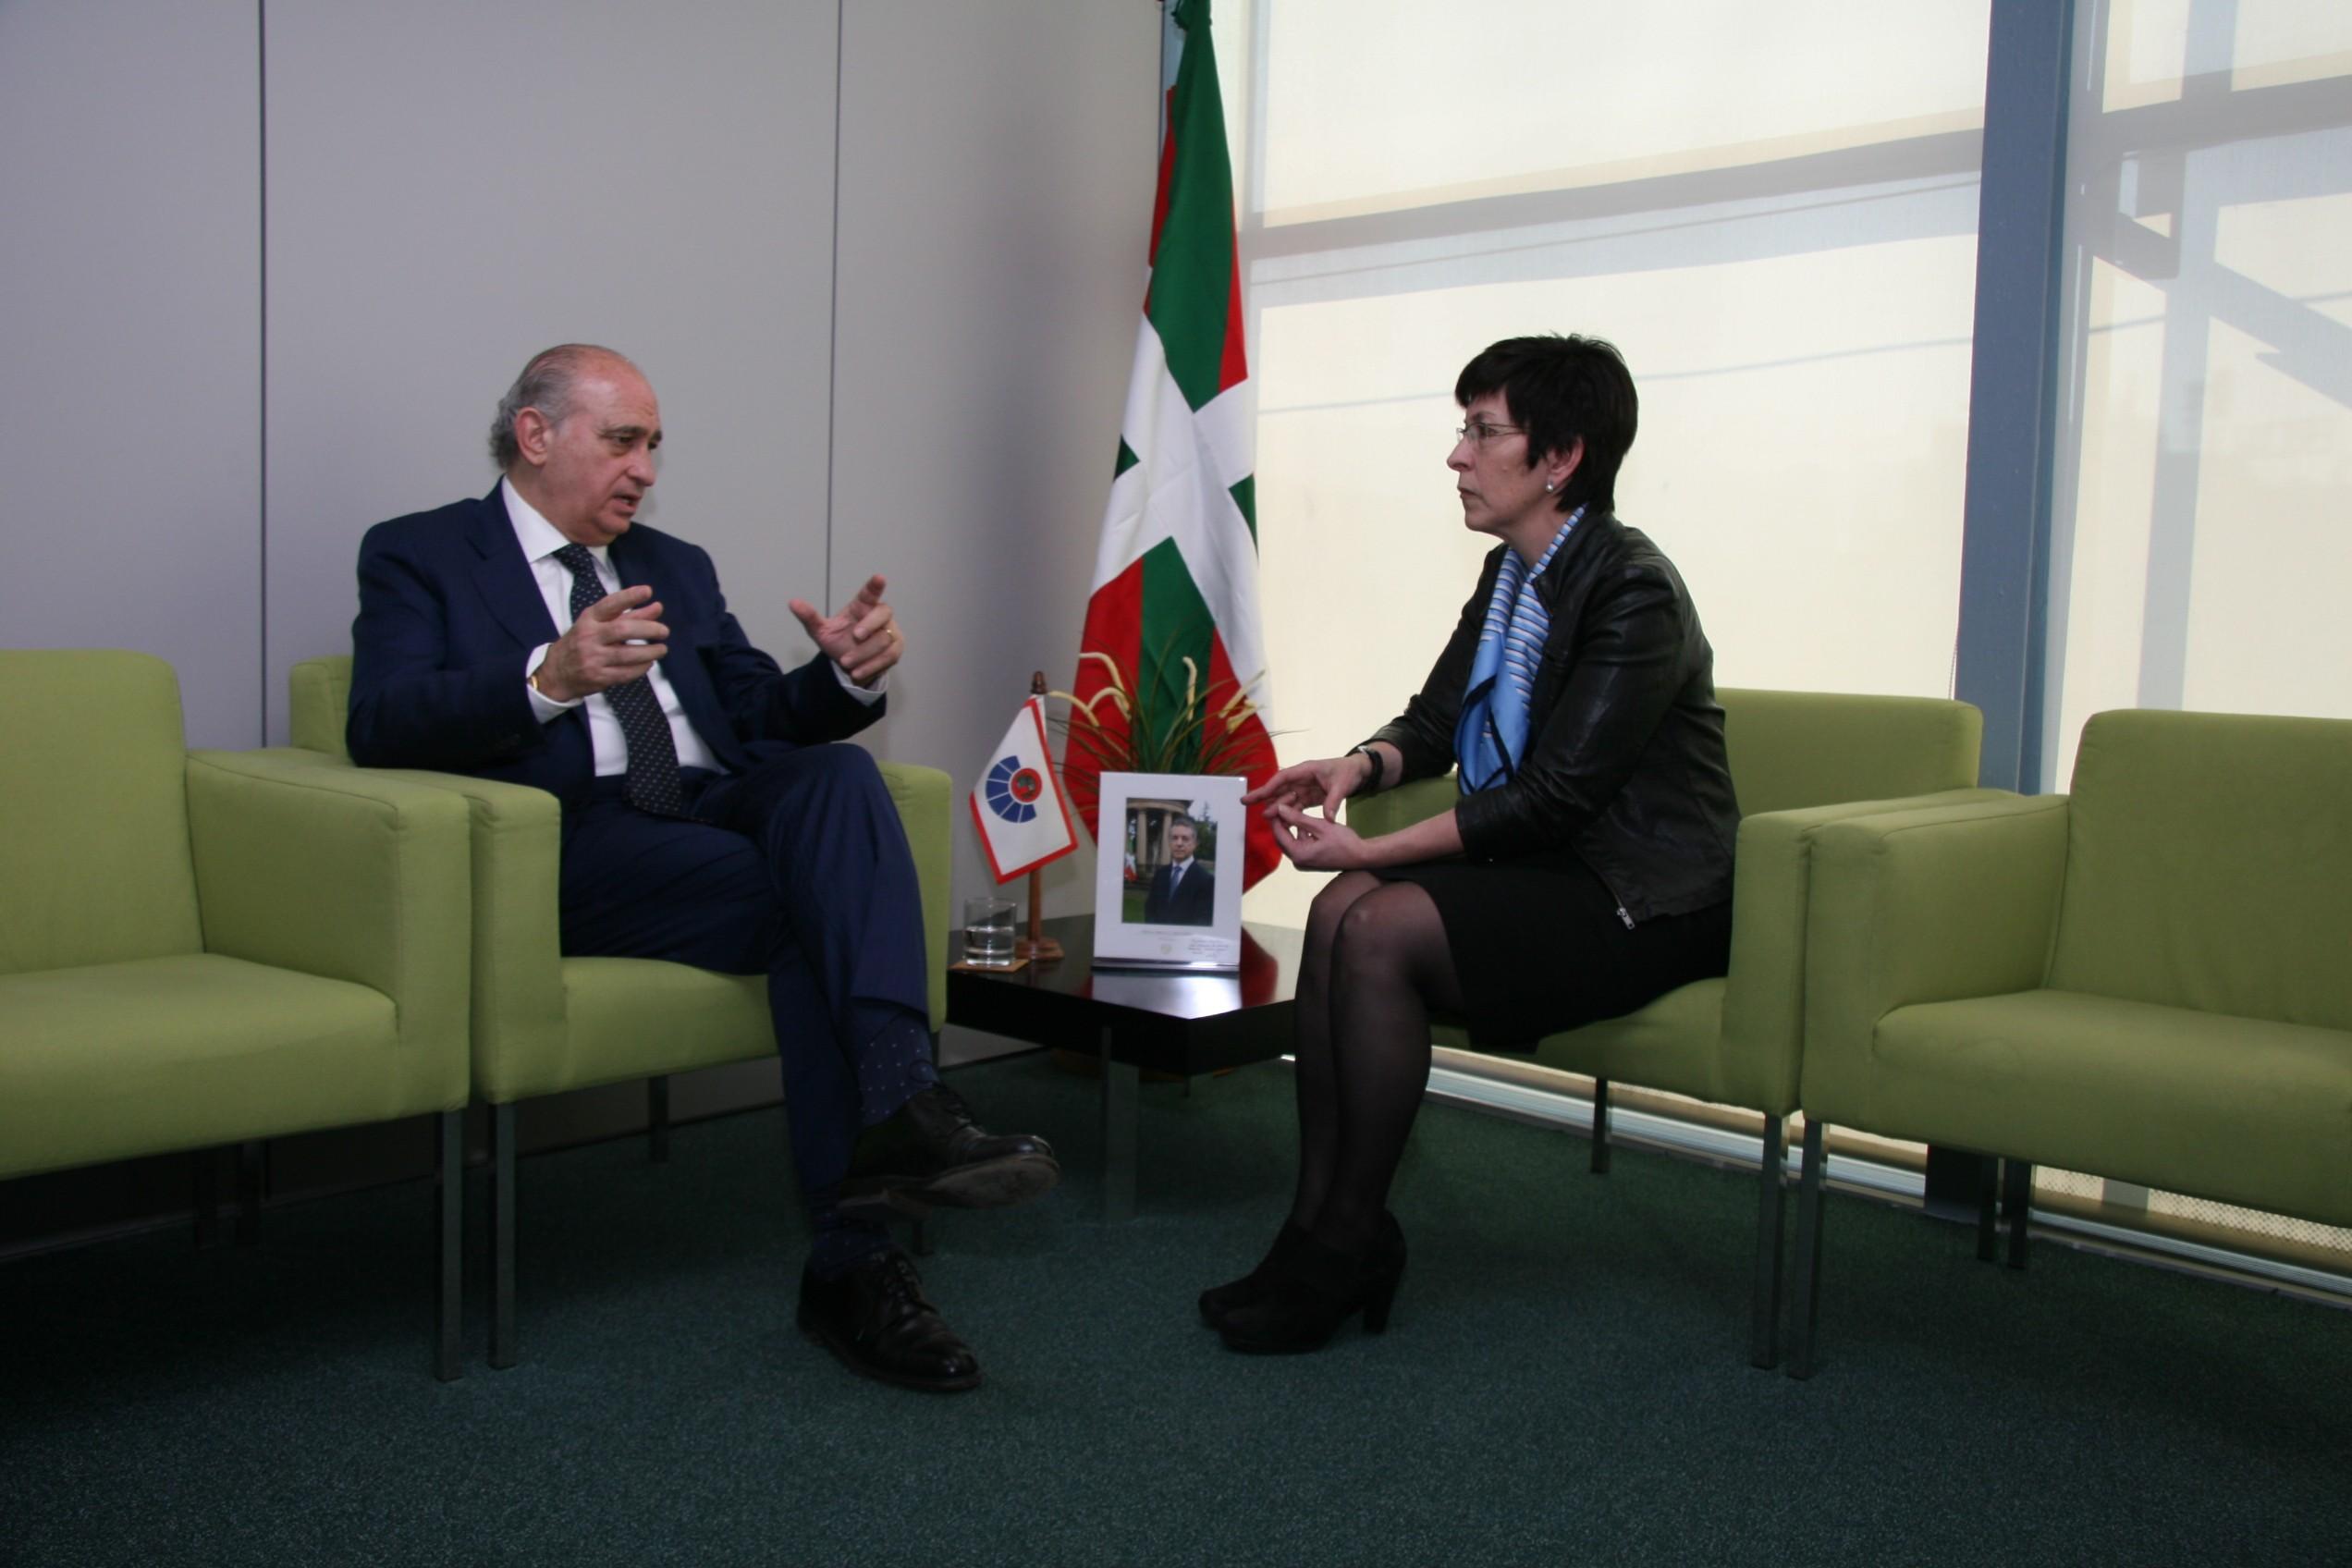 Foto_2_Ministro-Consejera.jpg